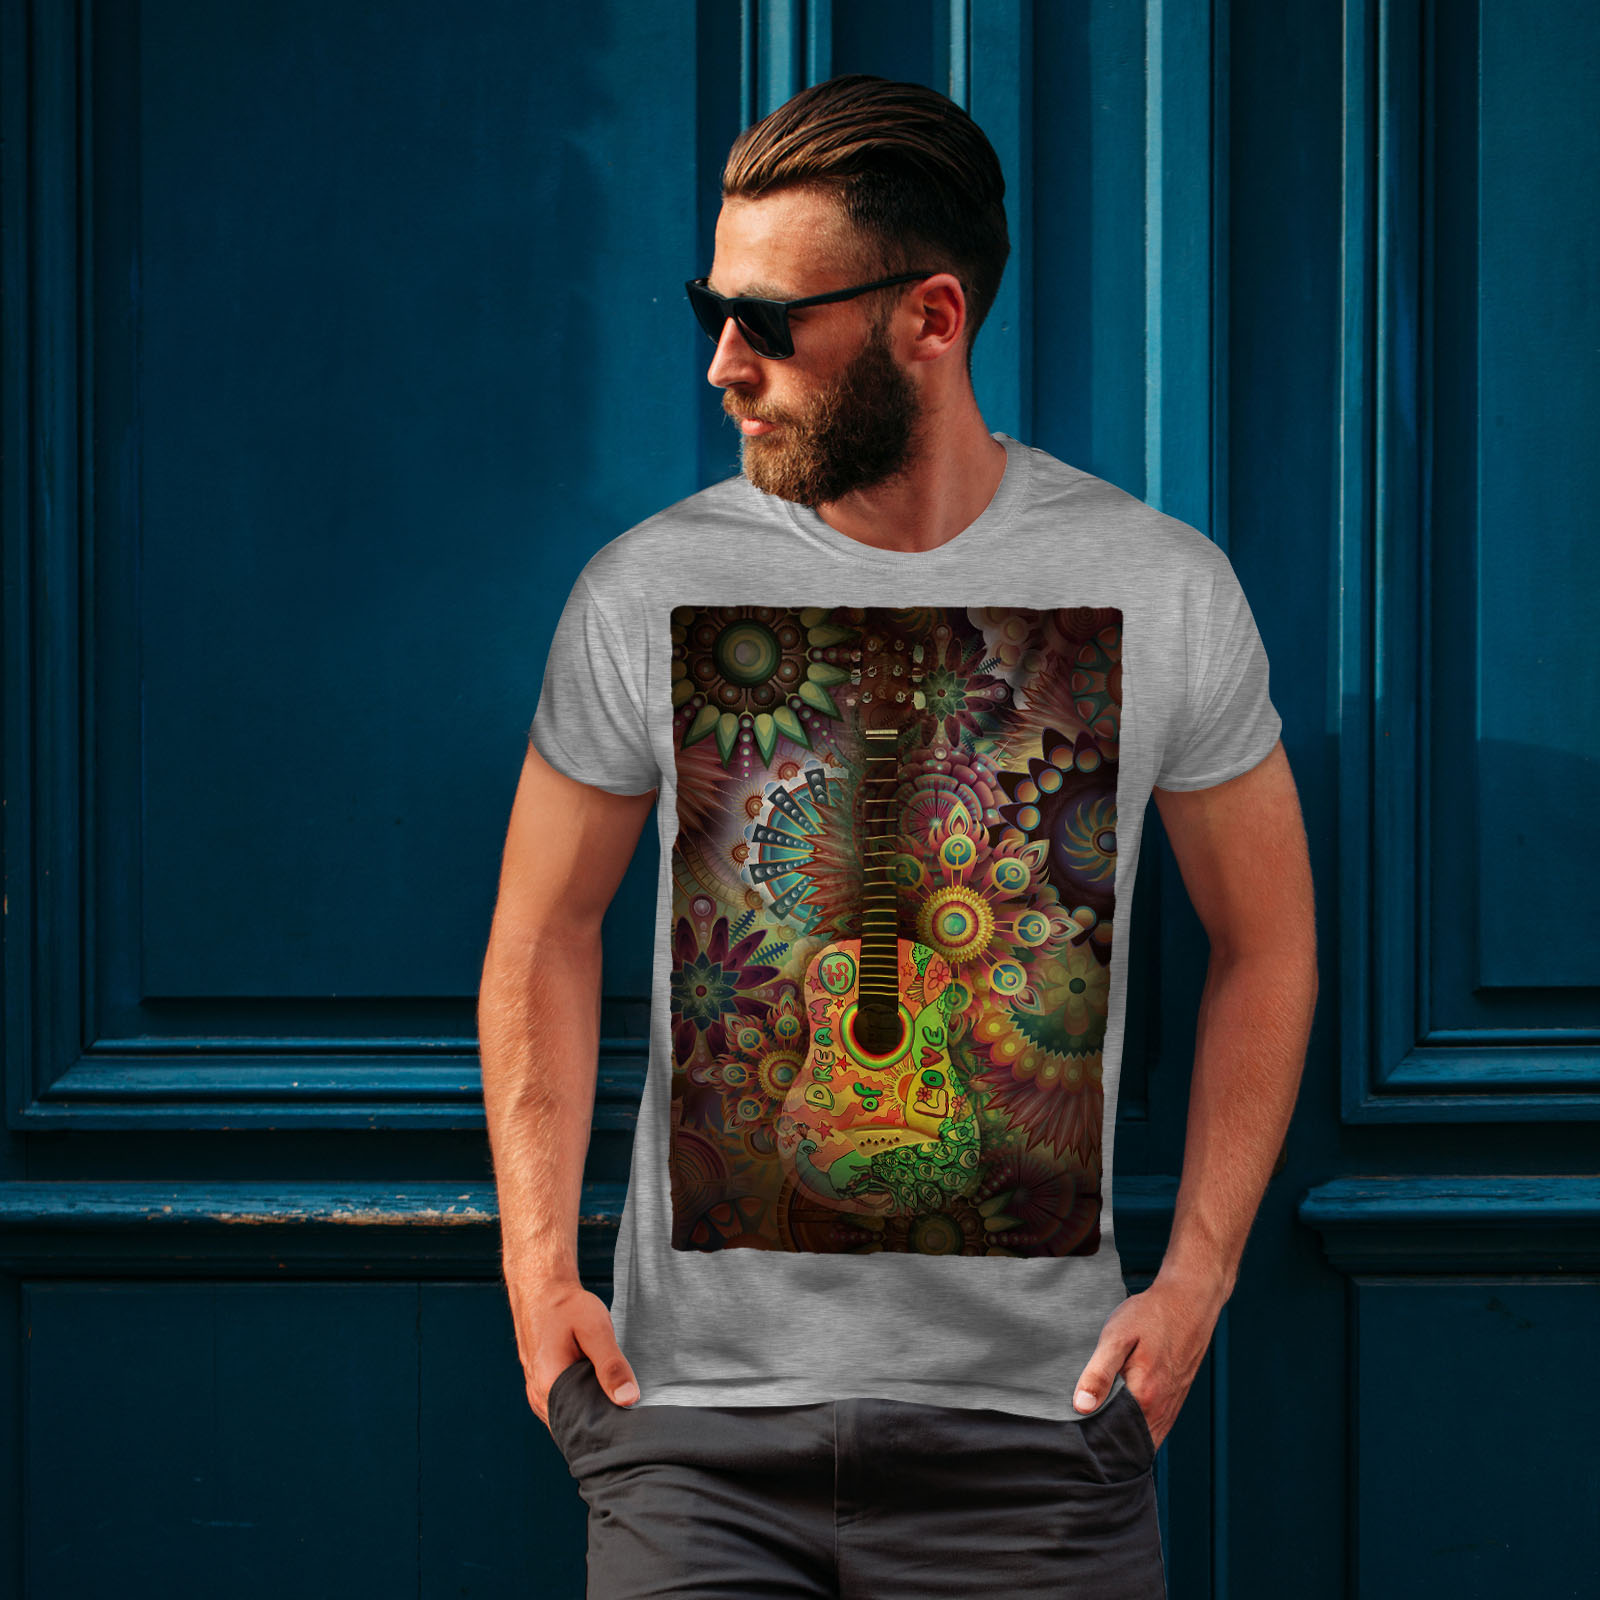 Wellcoda-Colorful-Guitar-Mens-T-shirt-Music-Graphic-Design-Printed-Tee thumbnail 16